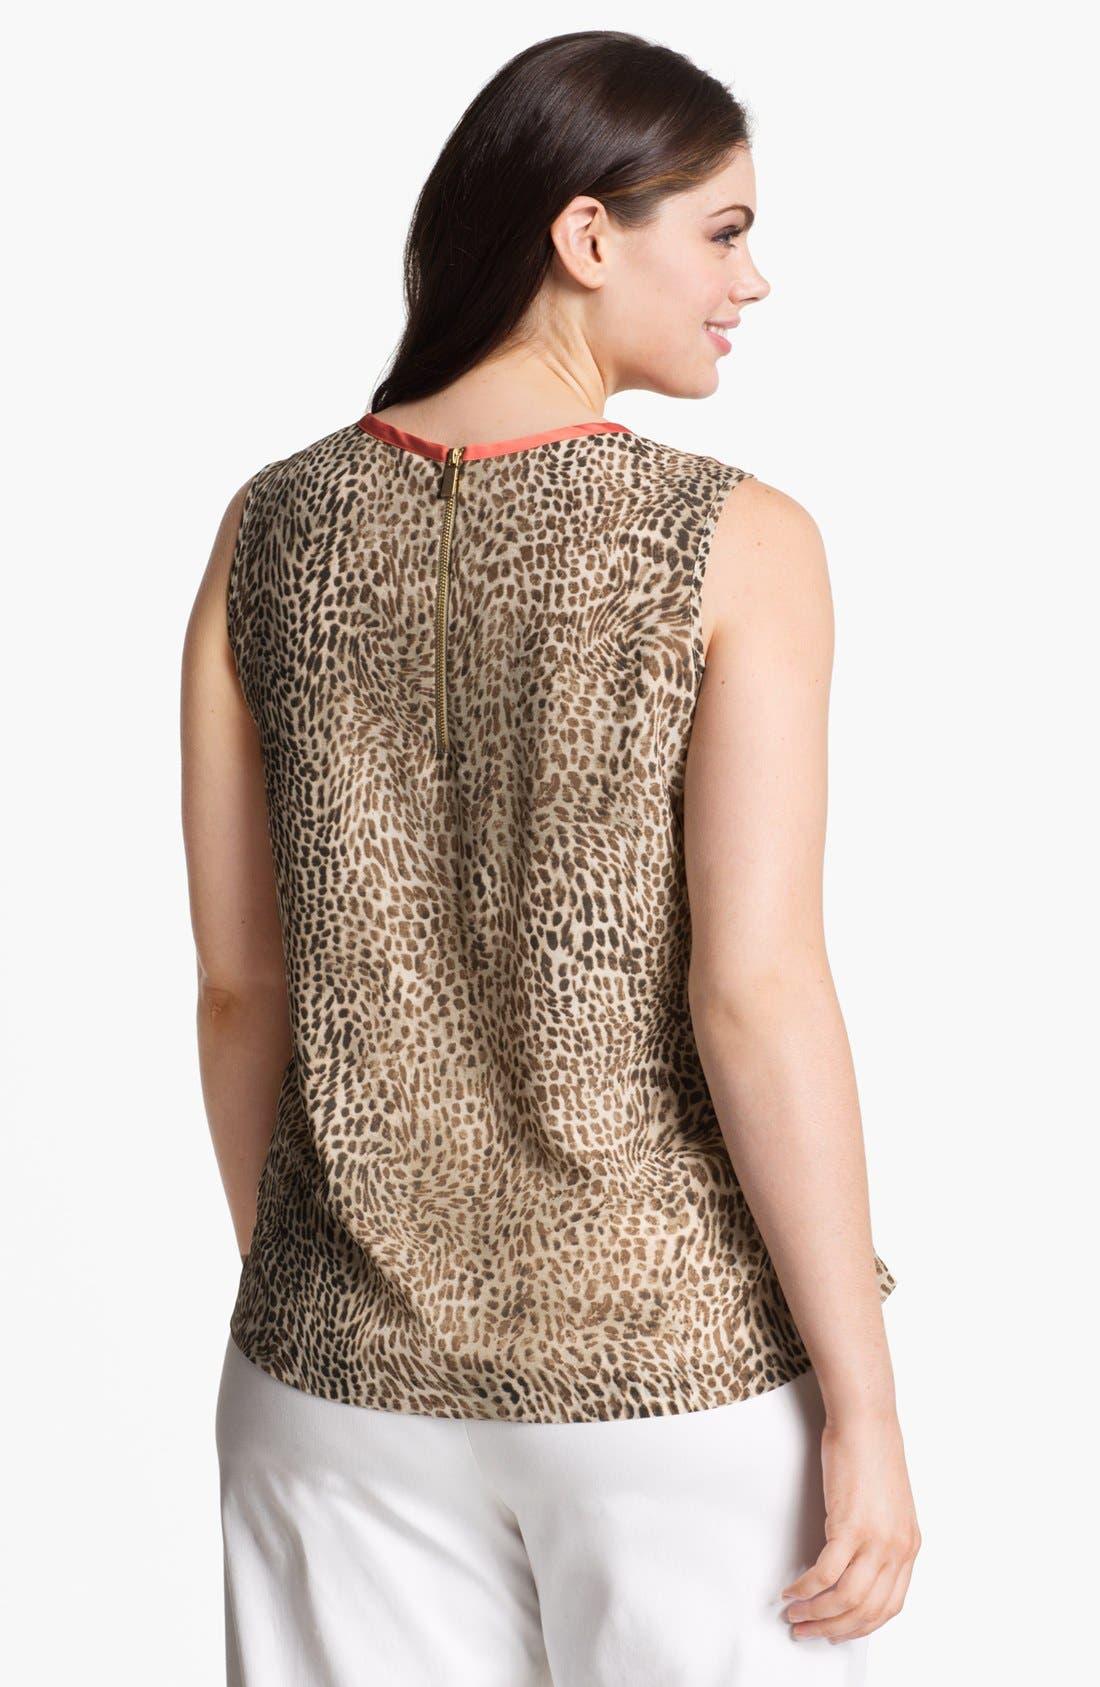 Alternate Image 2  - Vince Camuto Cheetah Print Blouse (Plus)